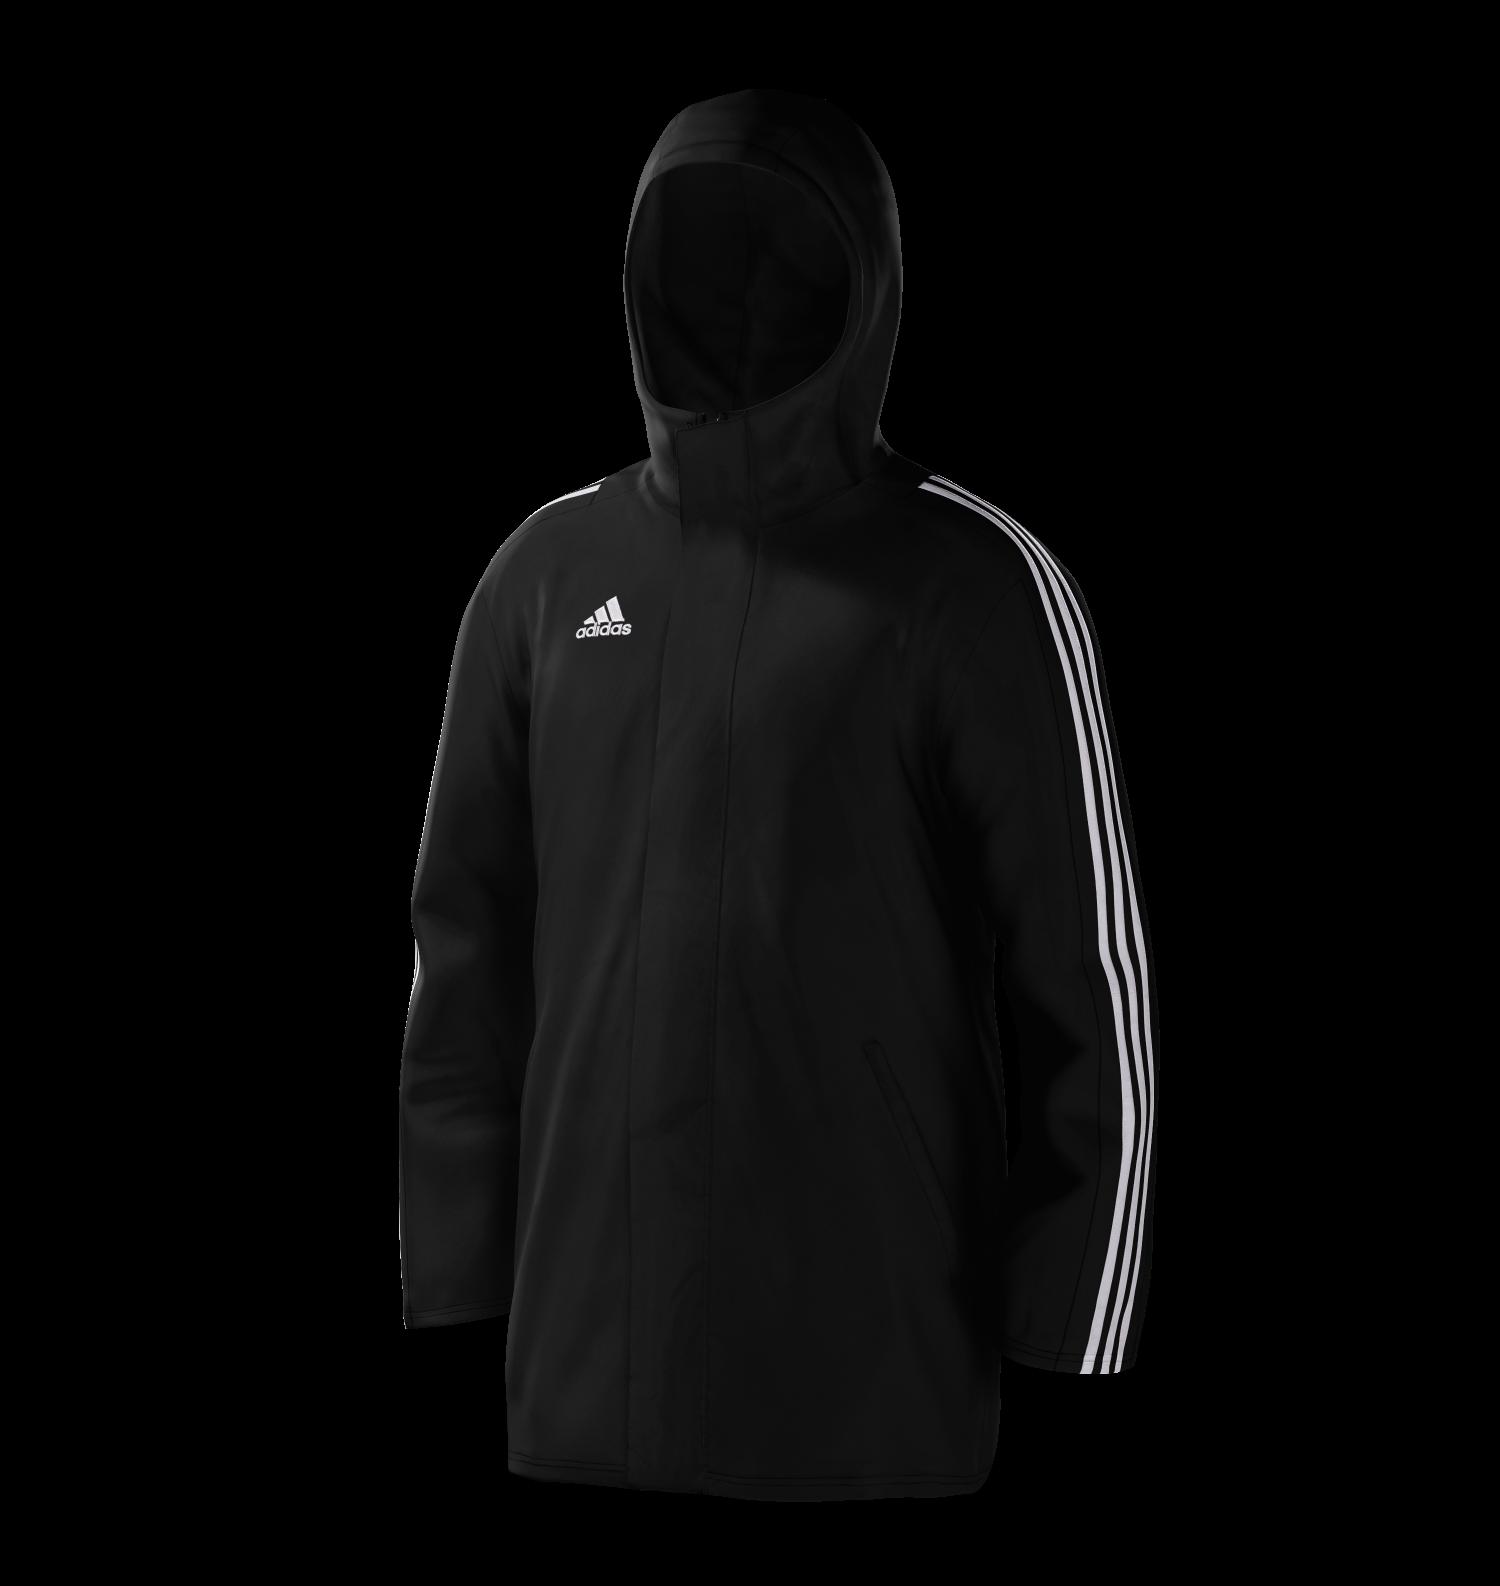 Stainborough CC Black Adidas Stadium Jacket